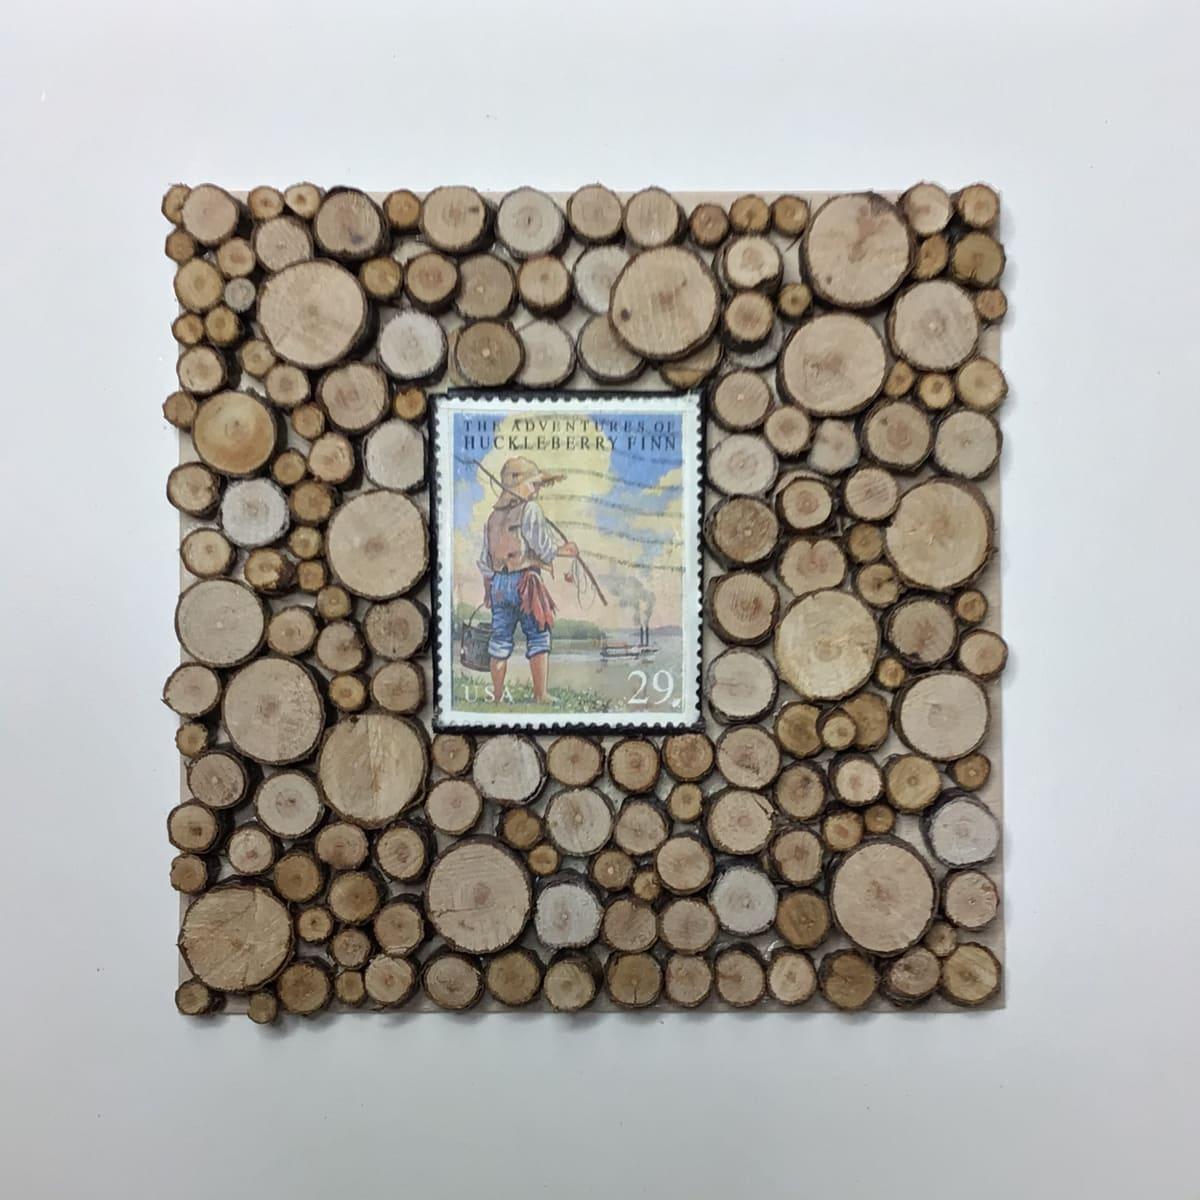 Huckleberry Finn by Richard B. Aakre